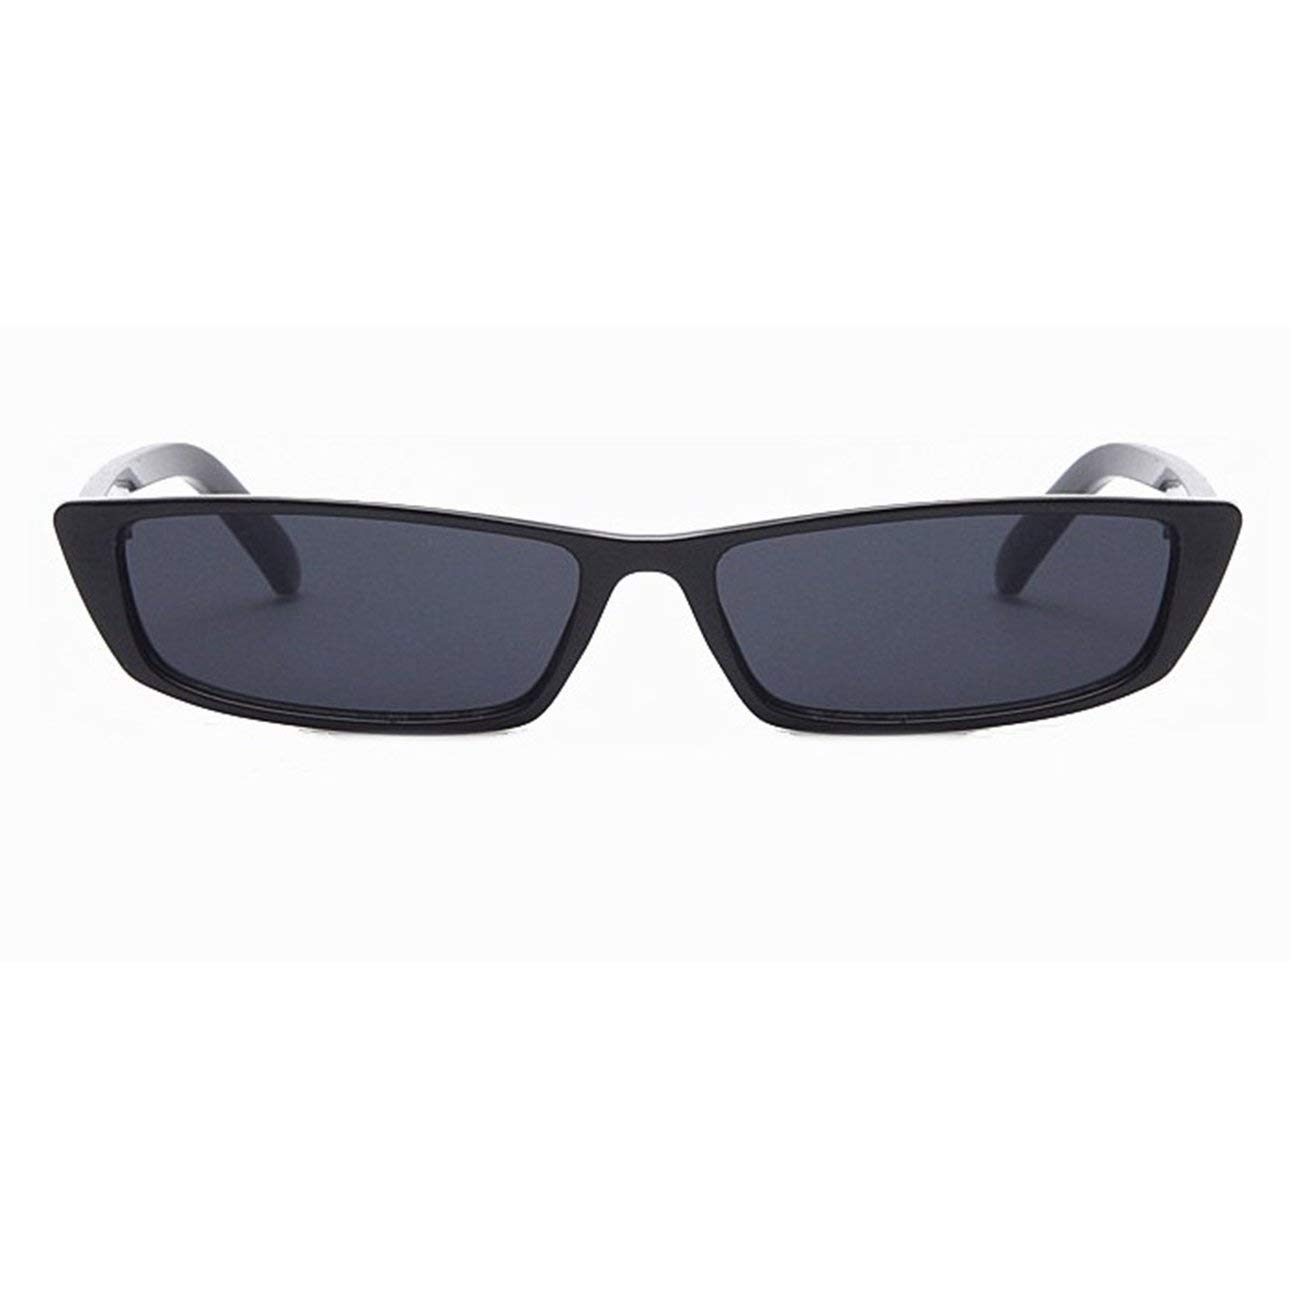 Liobaba Narrow-Necked Sunglasses